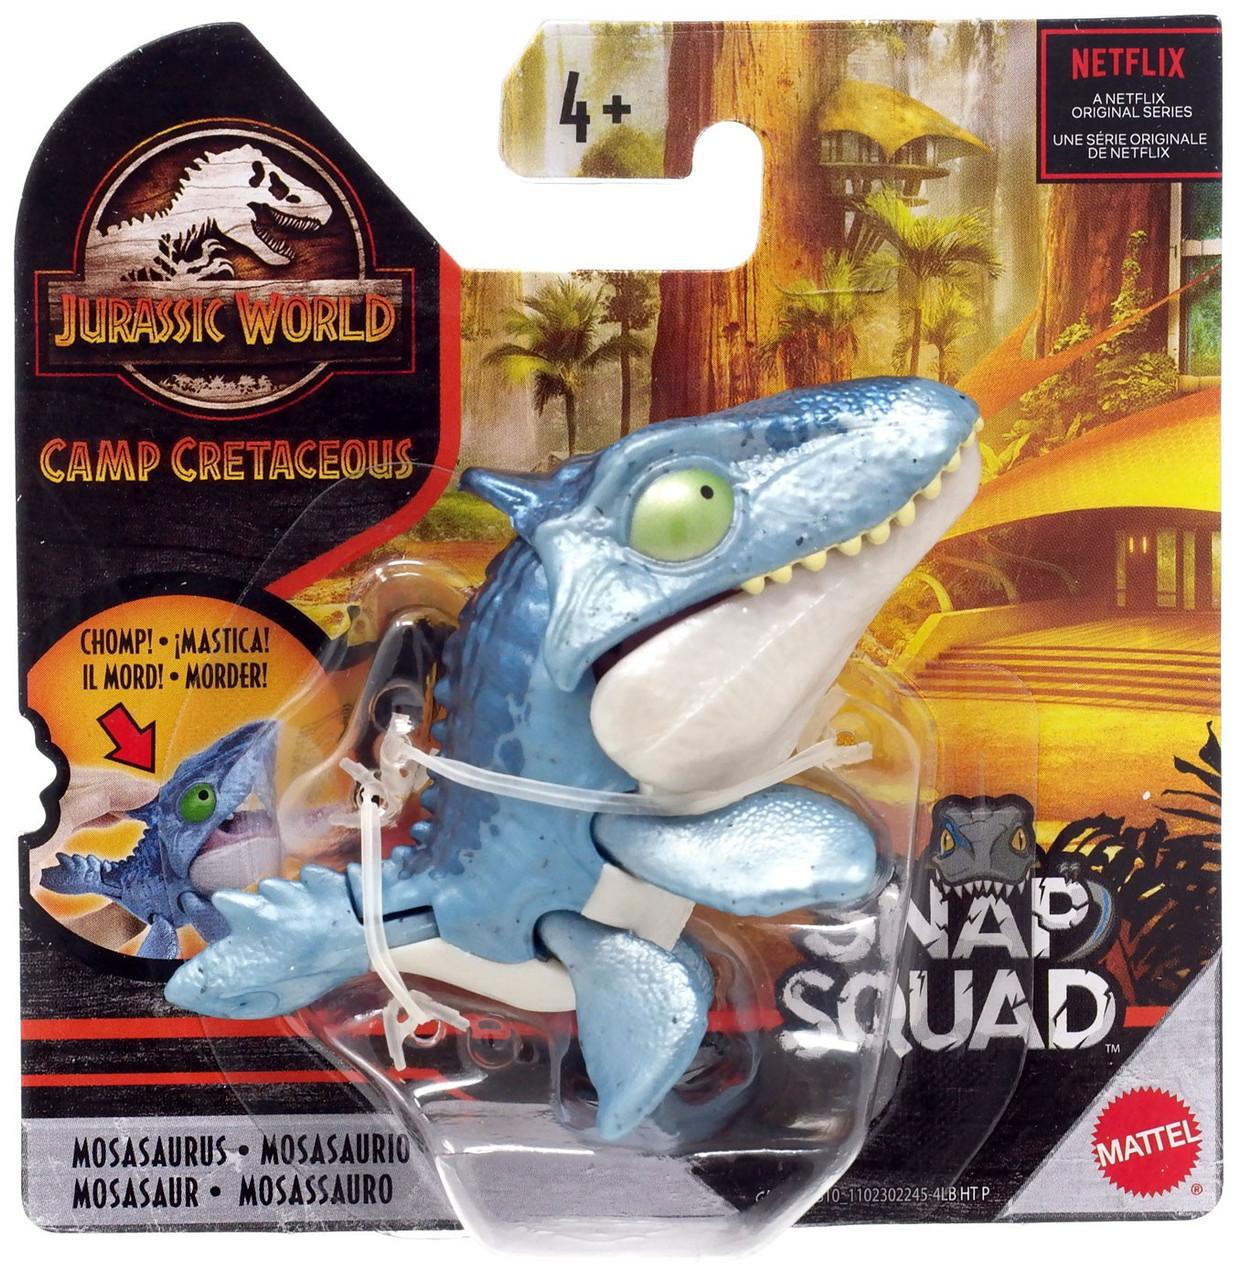 New Update Juracic World Roblox Jurassic World Camp Cretaceous Snap Squad Mosasaurus Mini Figure Netflix Version Mattel Toys Toywiz